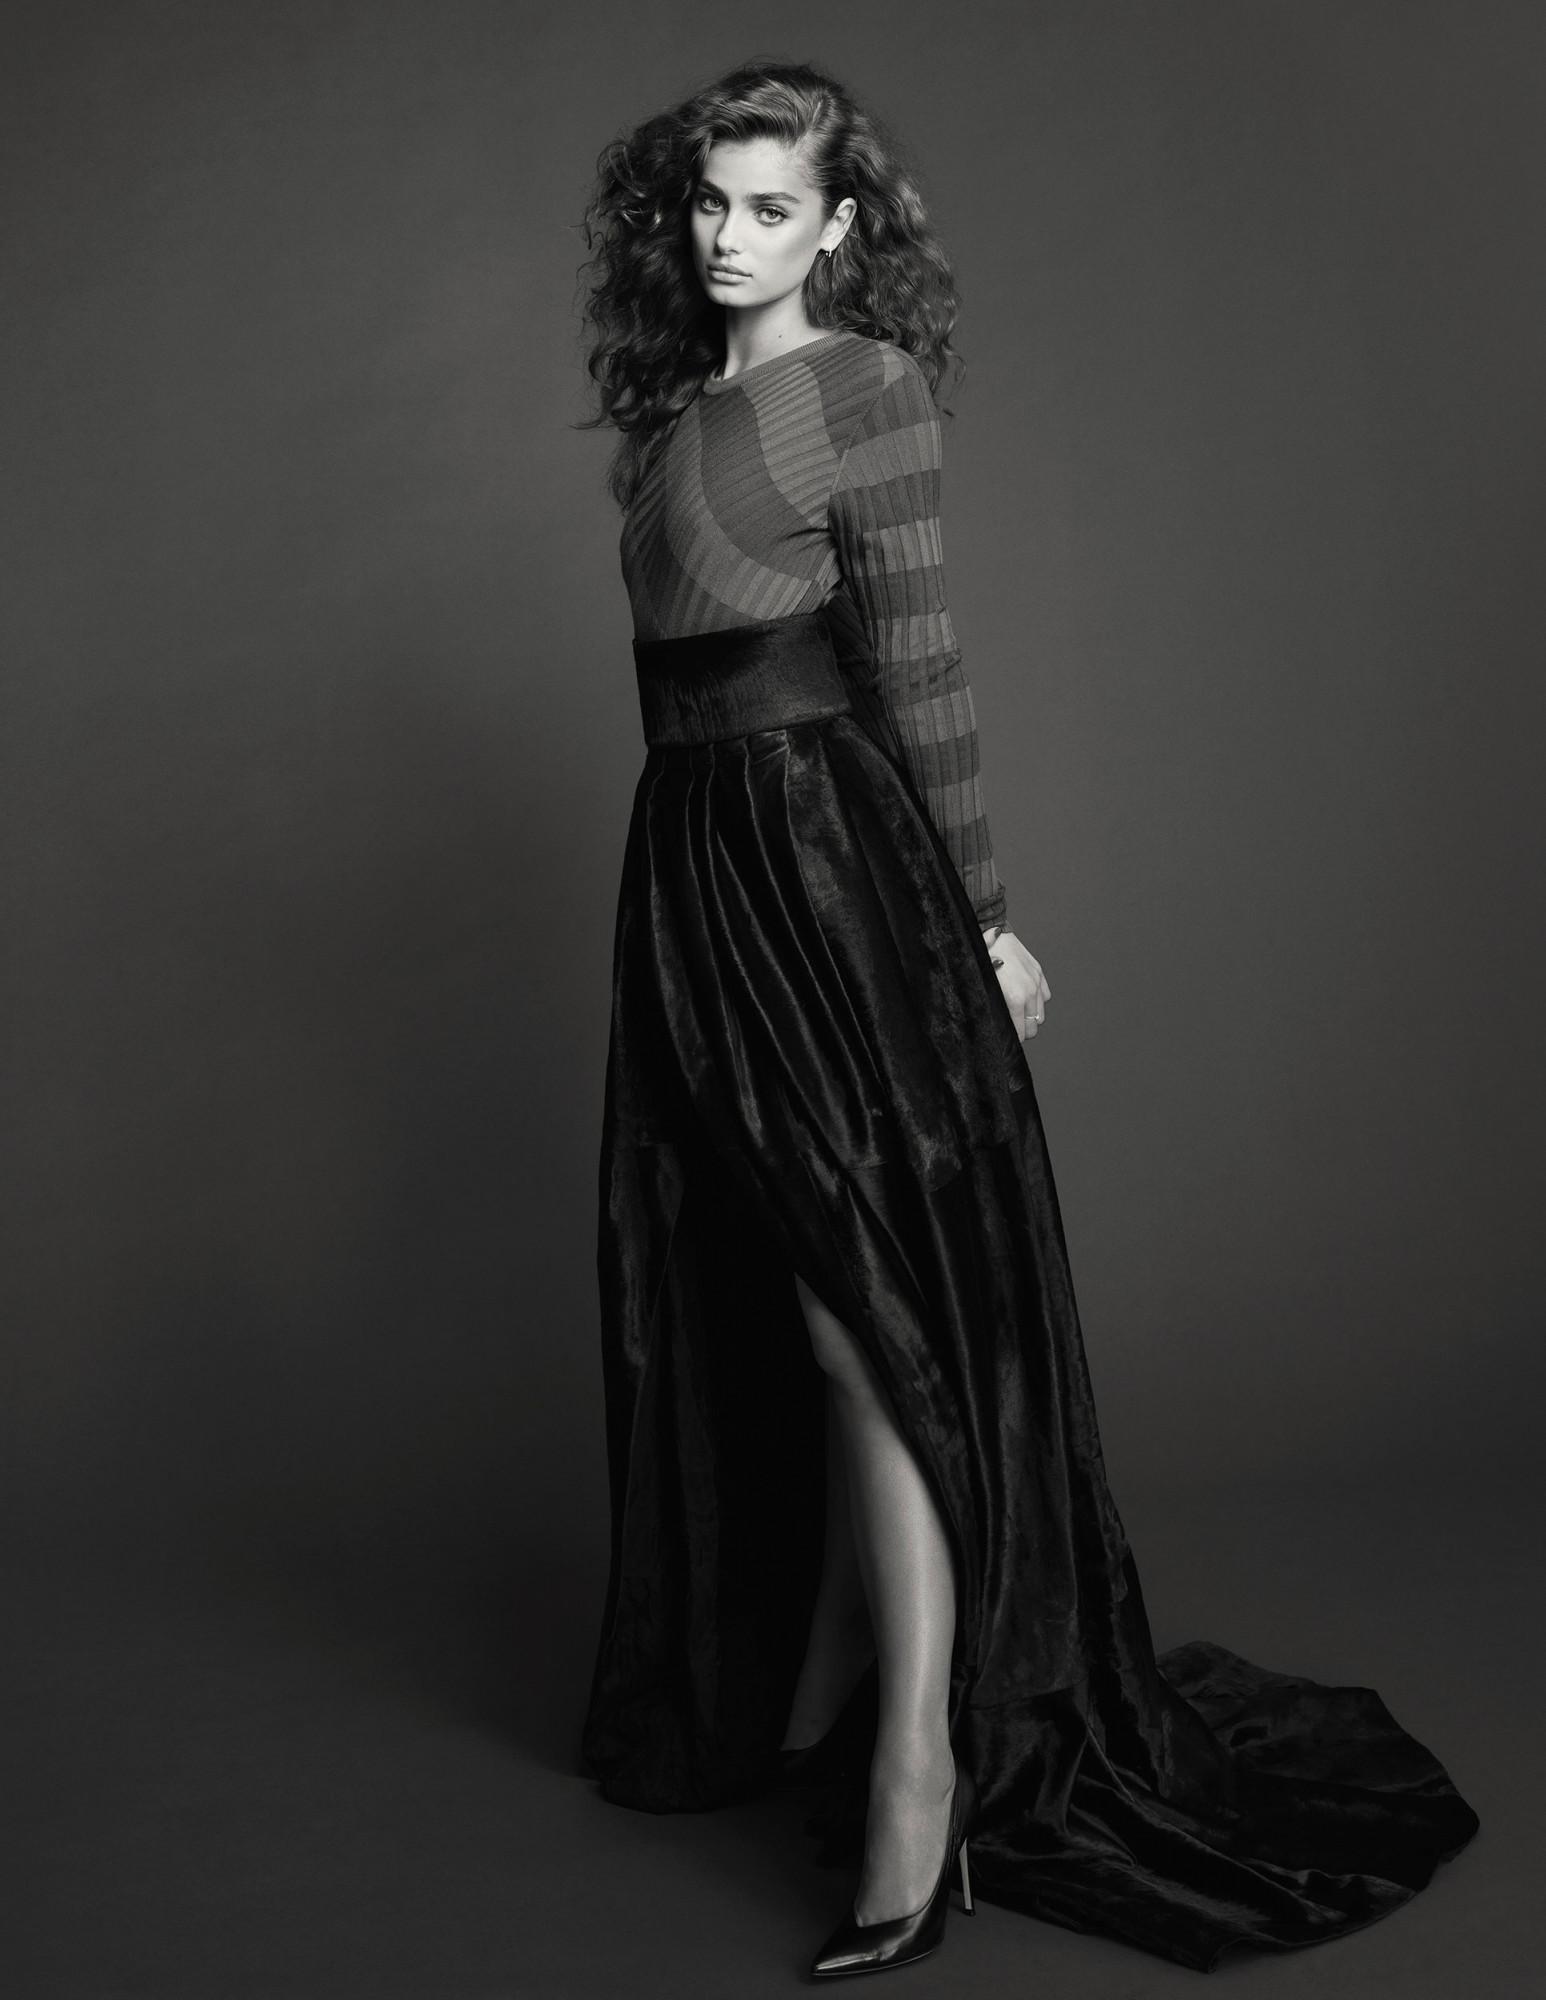 Bjorn Iooss Vogue Spain - Taylor Hill